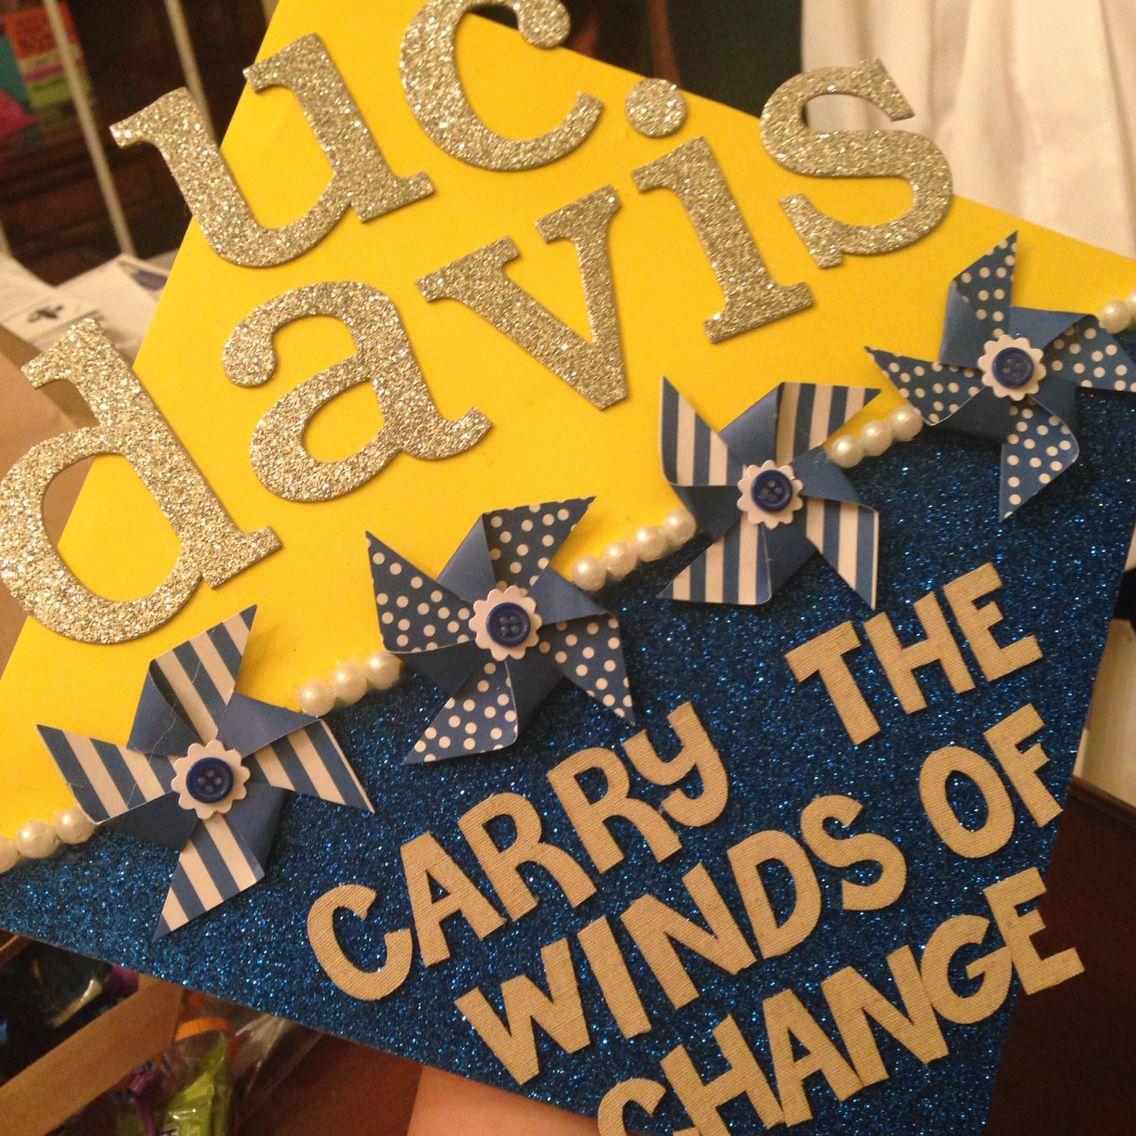 Uc Davis Graduation 2020.Graduation Cap Uc Davis Carry The Winds Of Change Cap